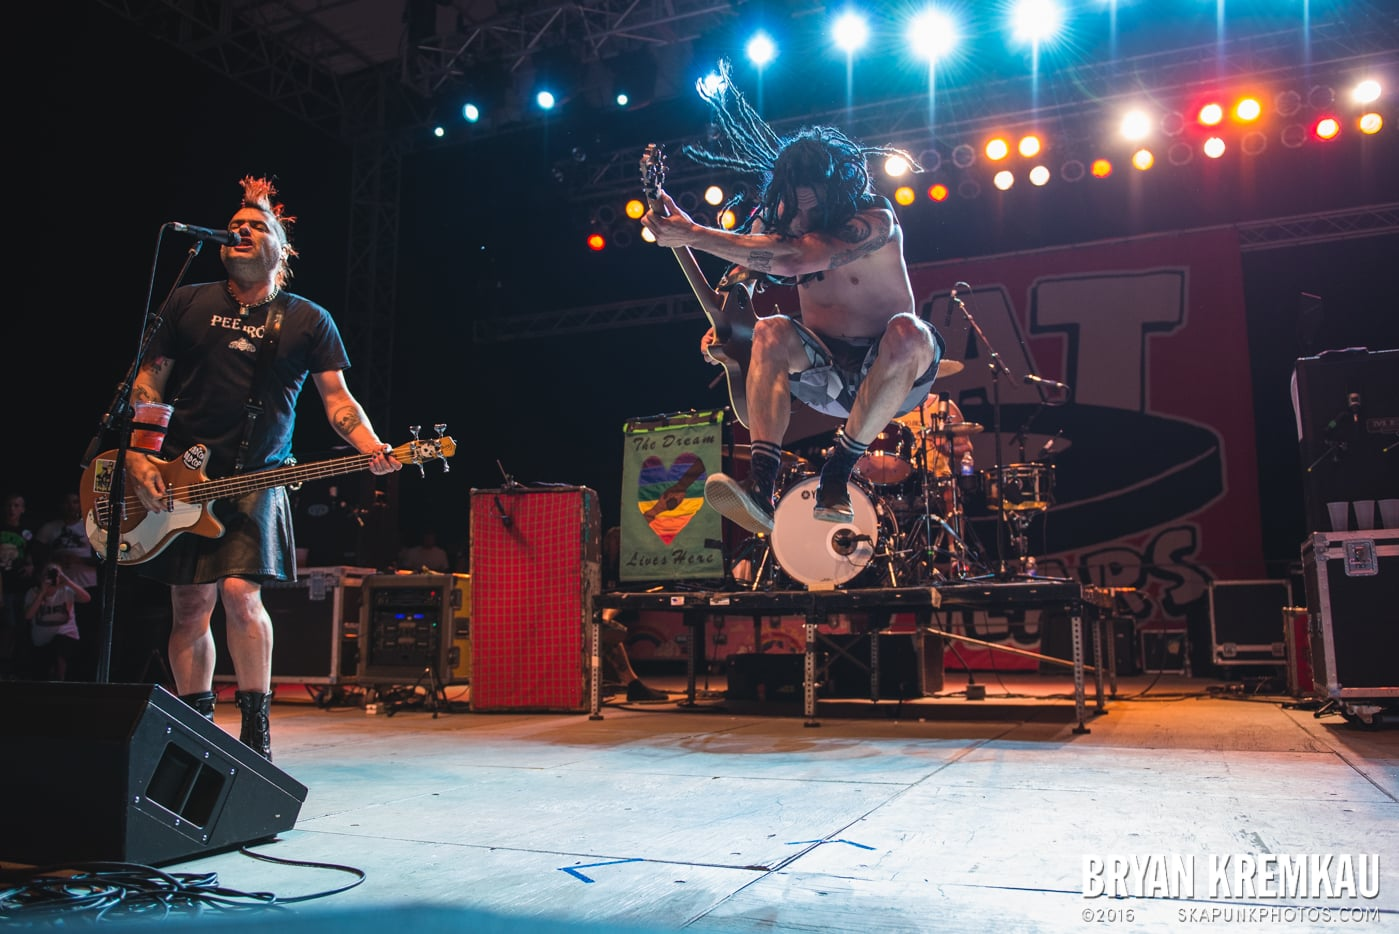 NOFX @ Stone Pony Summer Stage, Asbury Park, NJ - 8.15.15 (7)